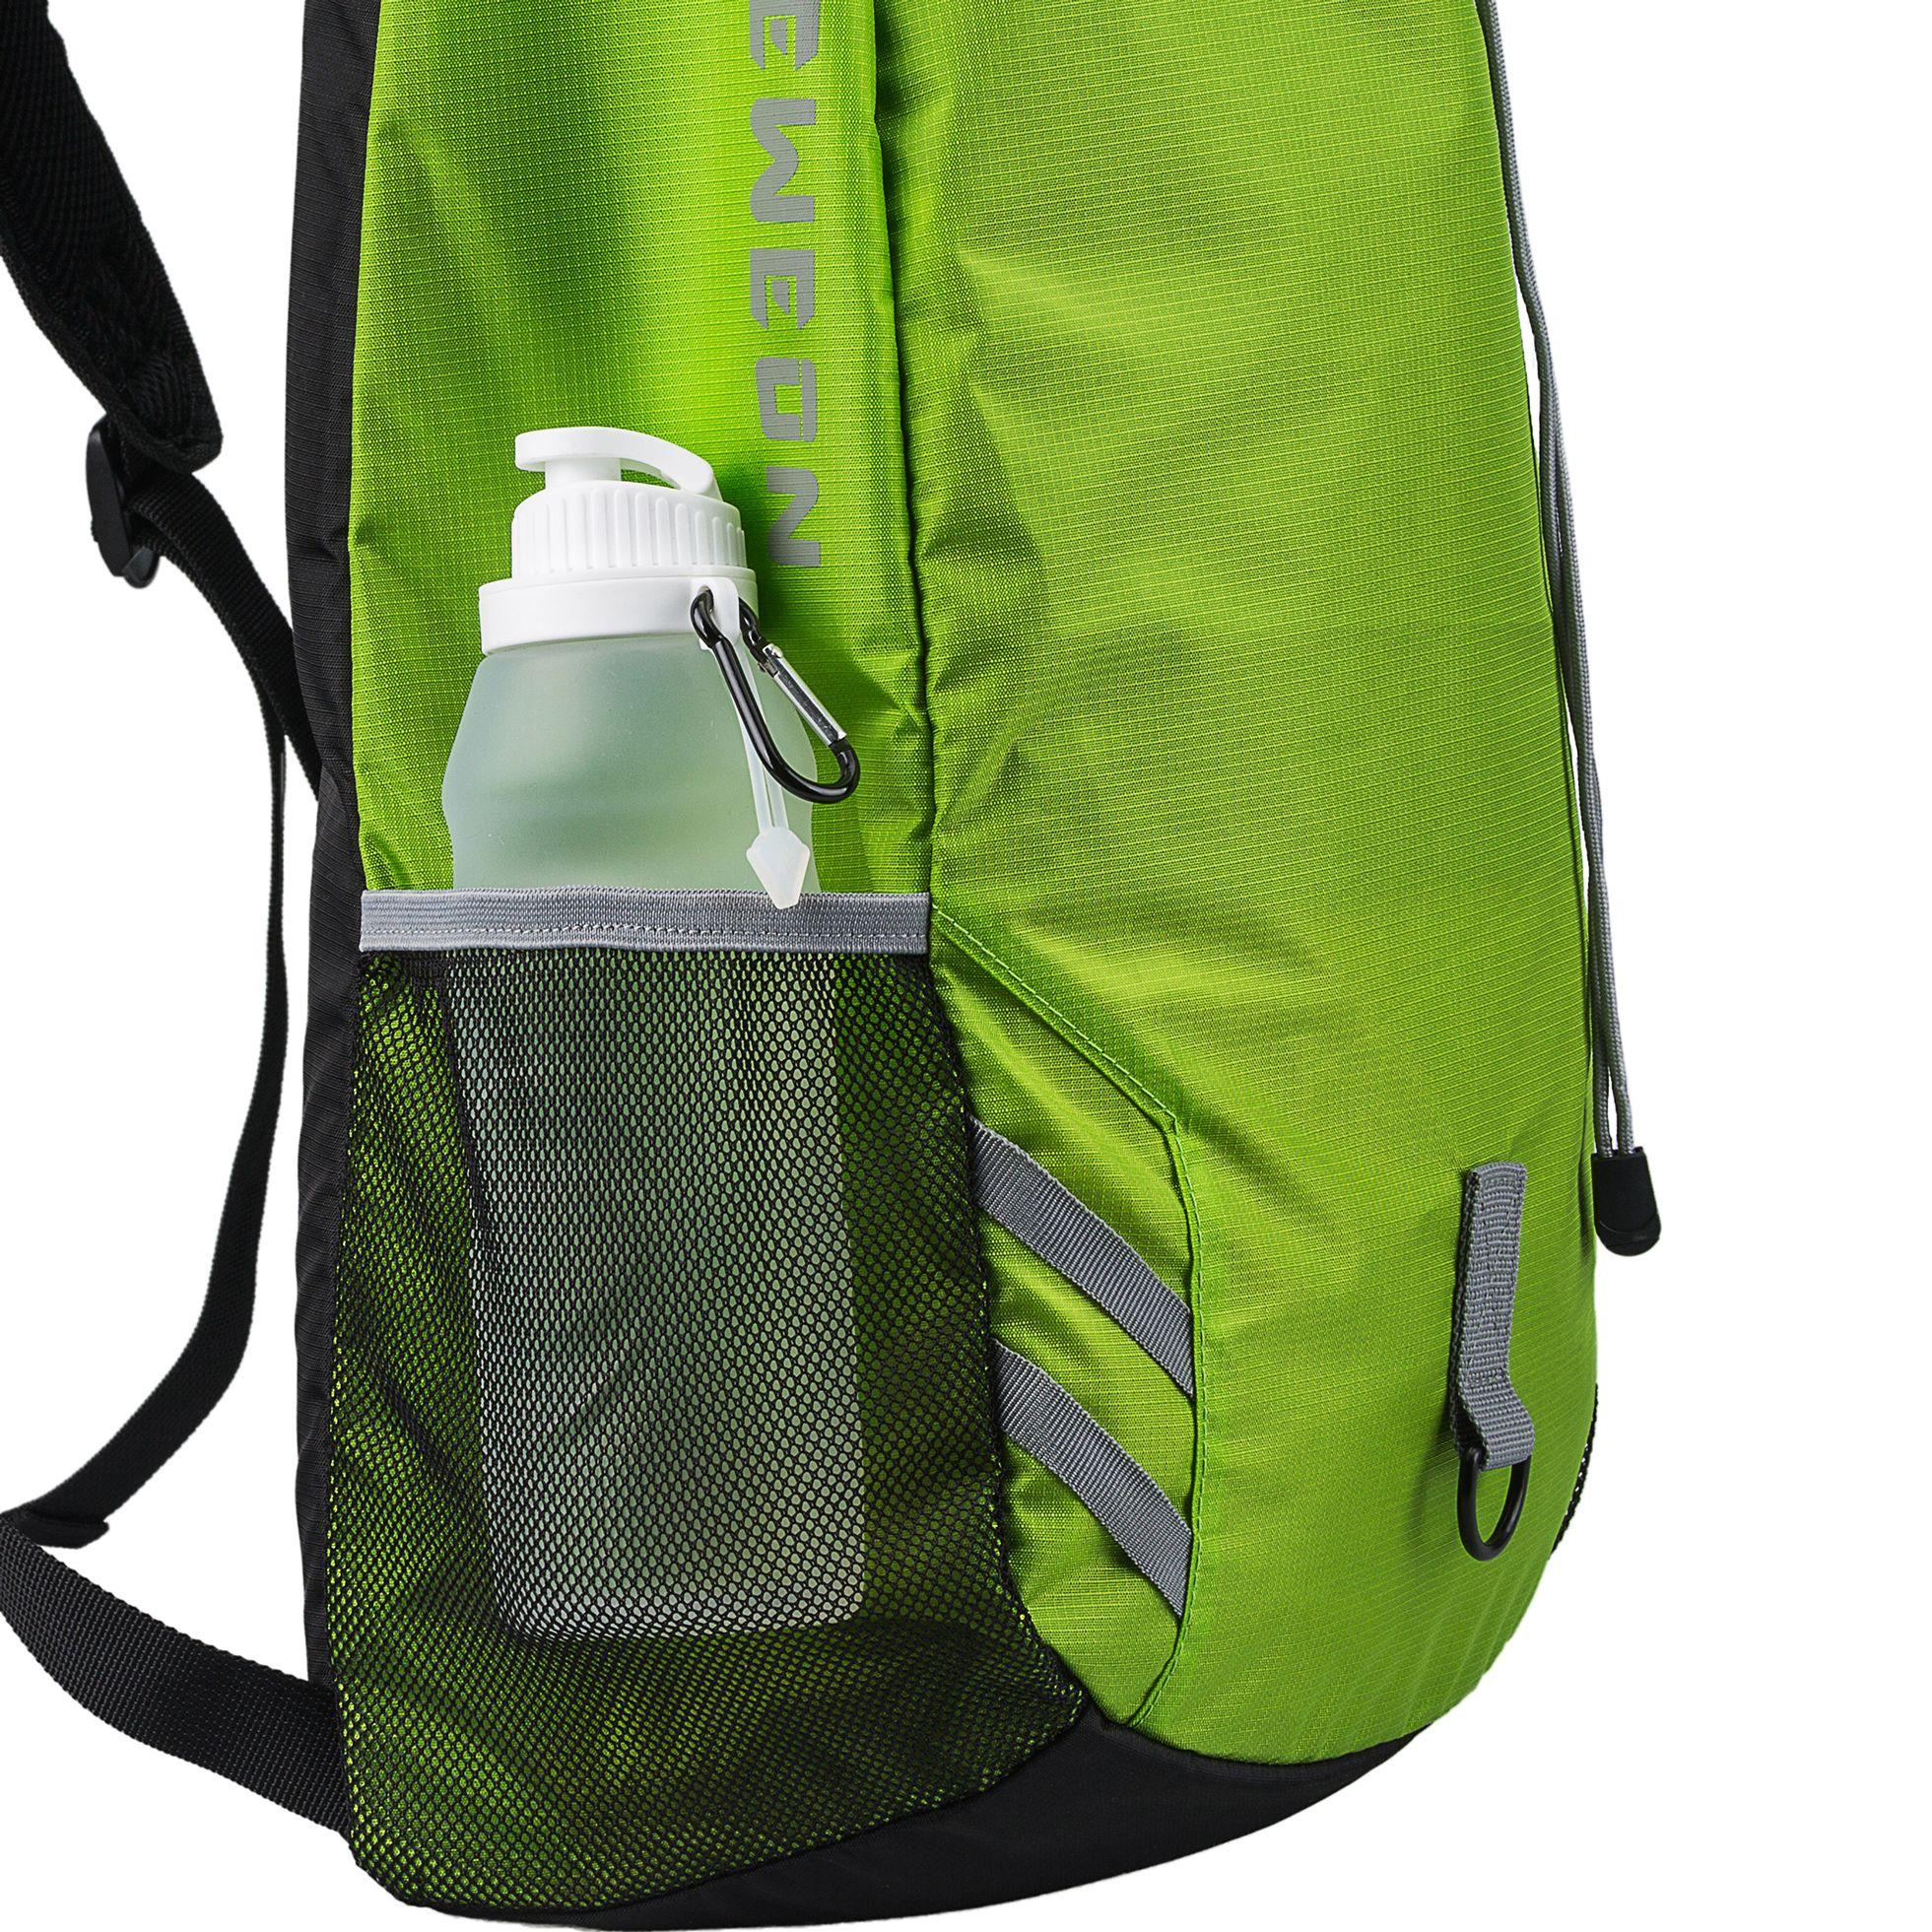 c3aa1ade09 sports backpack WEWEON Nylon Fabric sports bag 35L Men women Children  Outdoor backpack travel backpack gym bag bike backpack